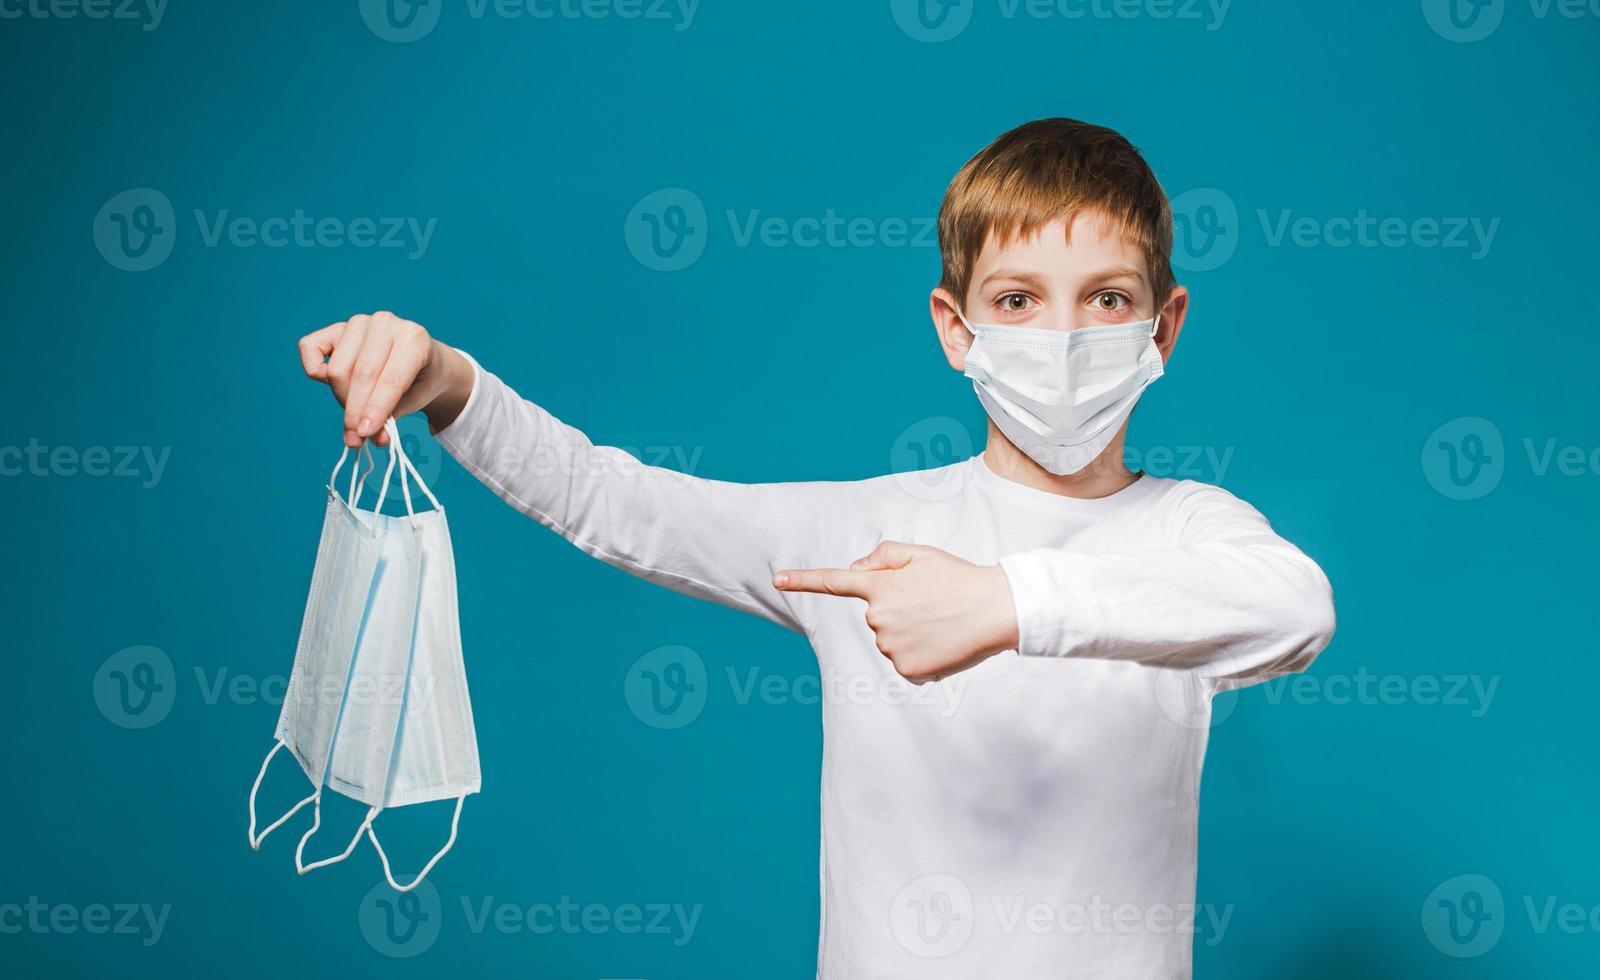 Boy wearing protection mask pointing on masks photo